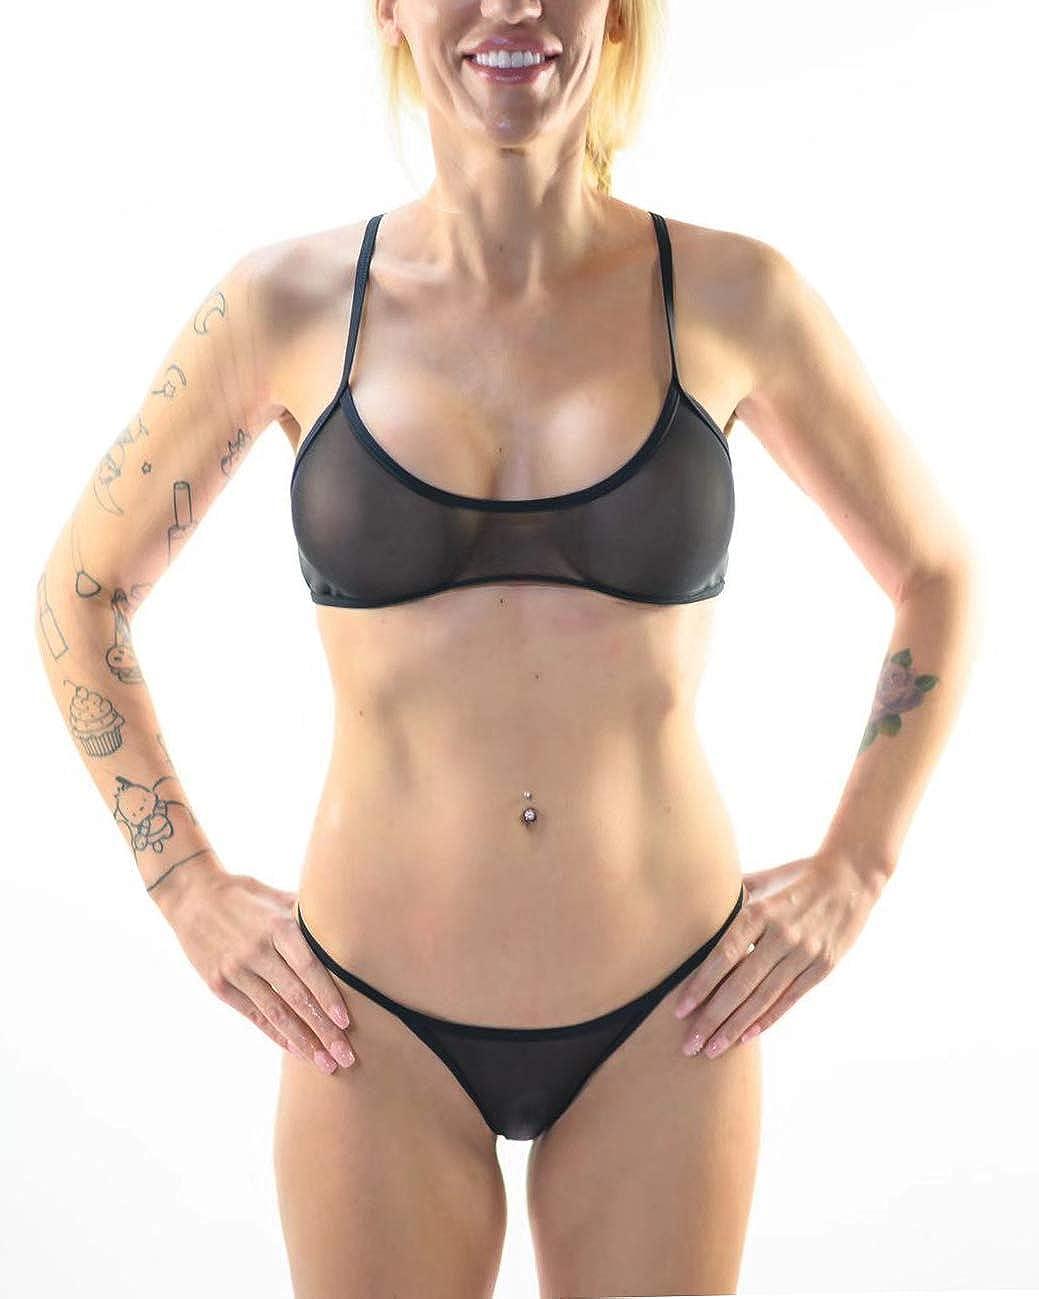 SHERRYLO Sheer Bikini Set See Through Bathing Suit Women's Beachwear Mesh Swimwear Racer Bra Bikini Top Brazilian Bottom